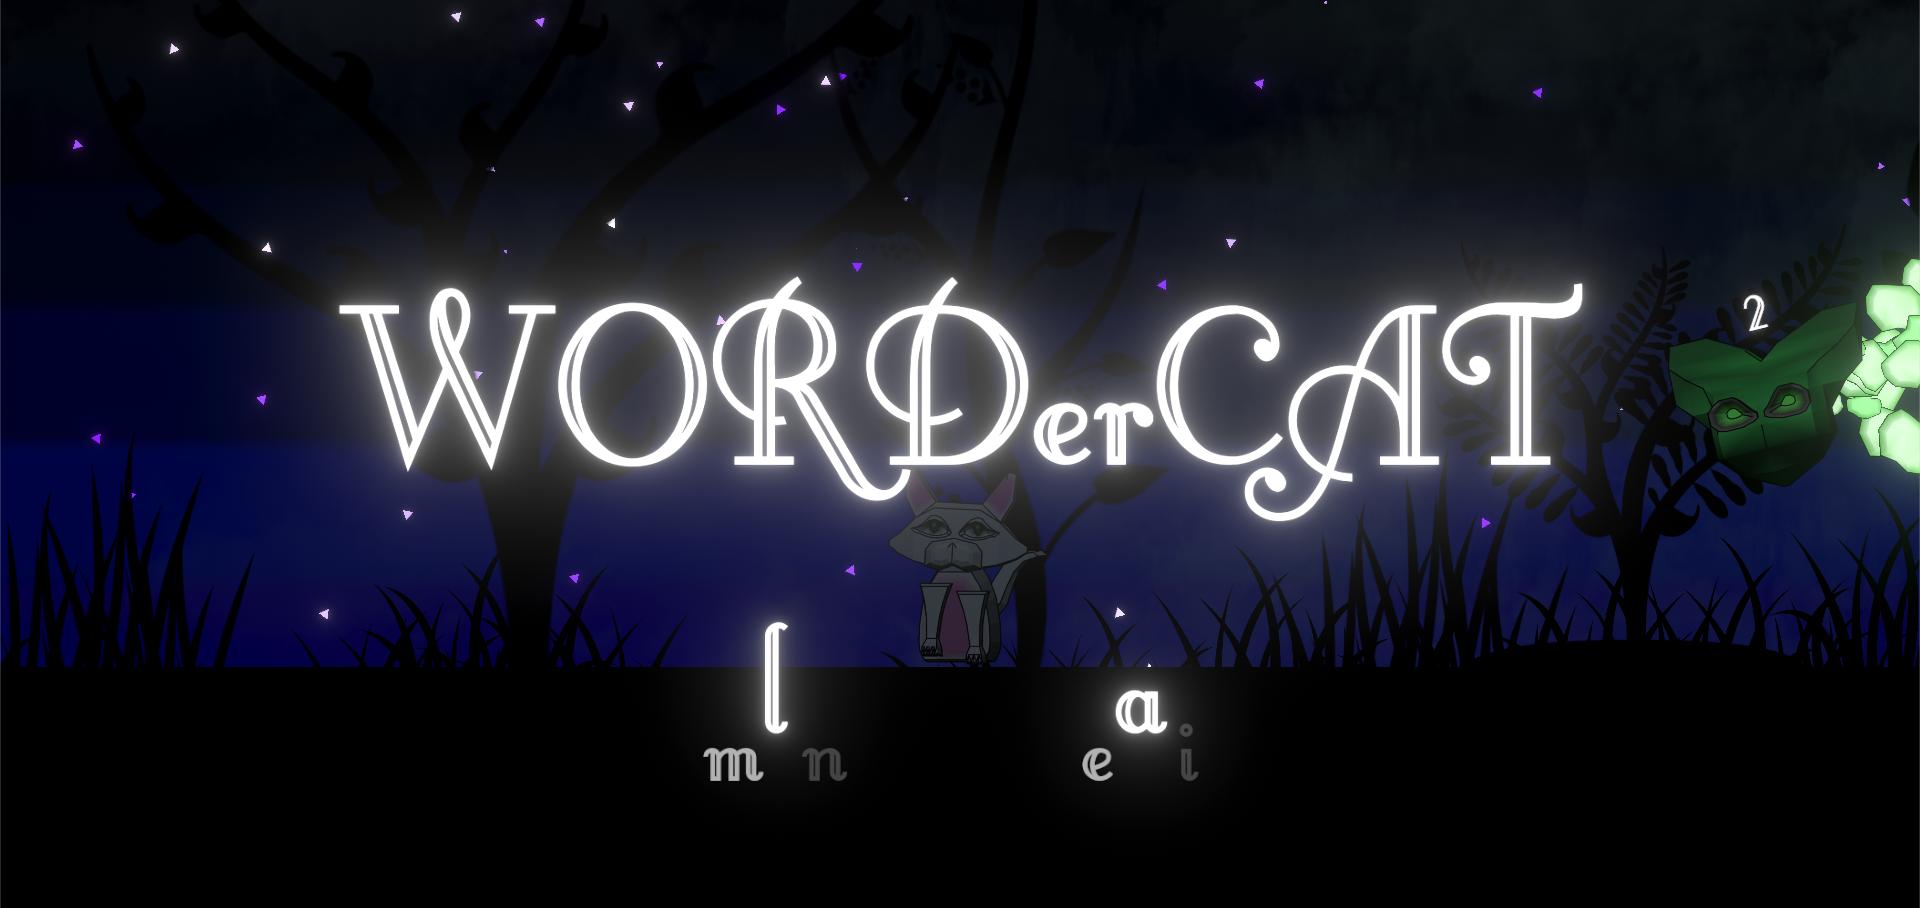 WORDerCAT